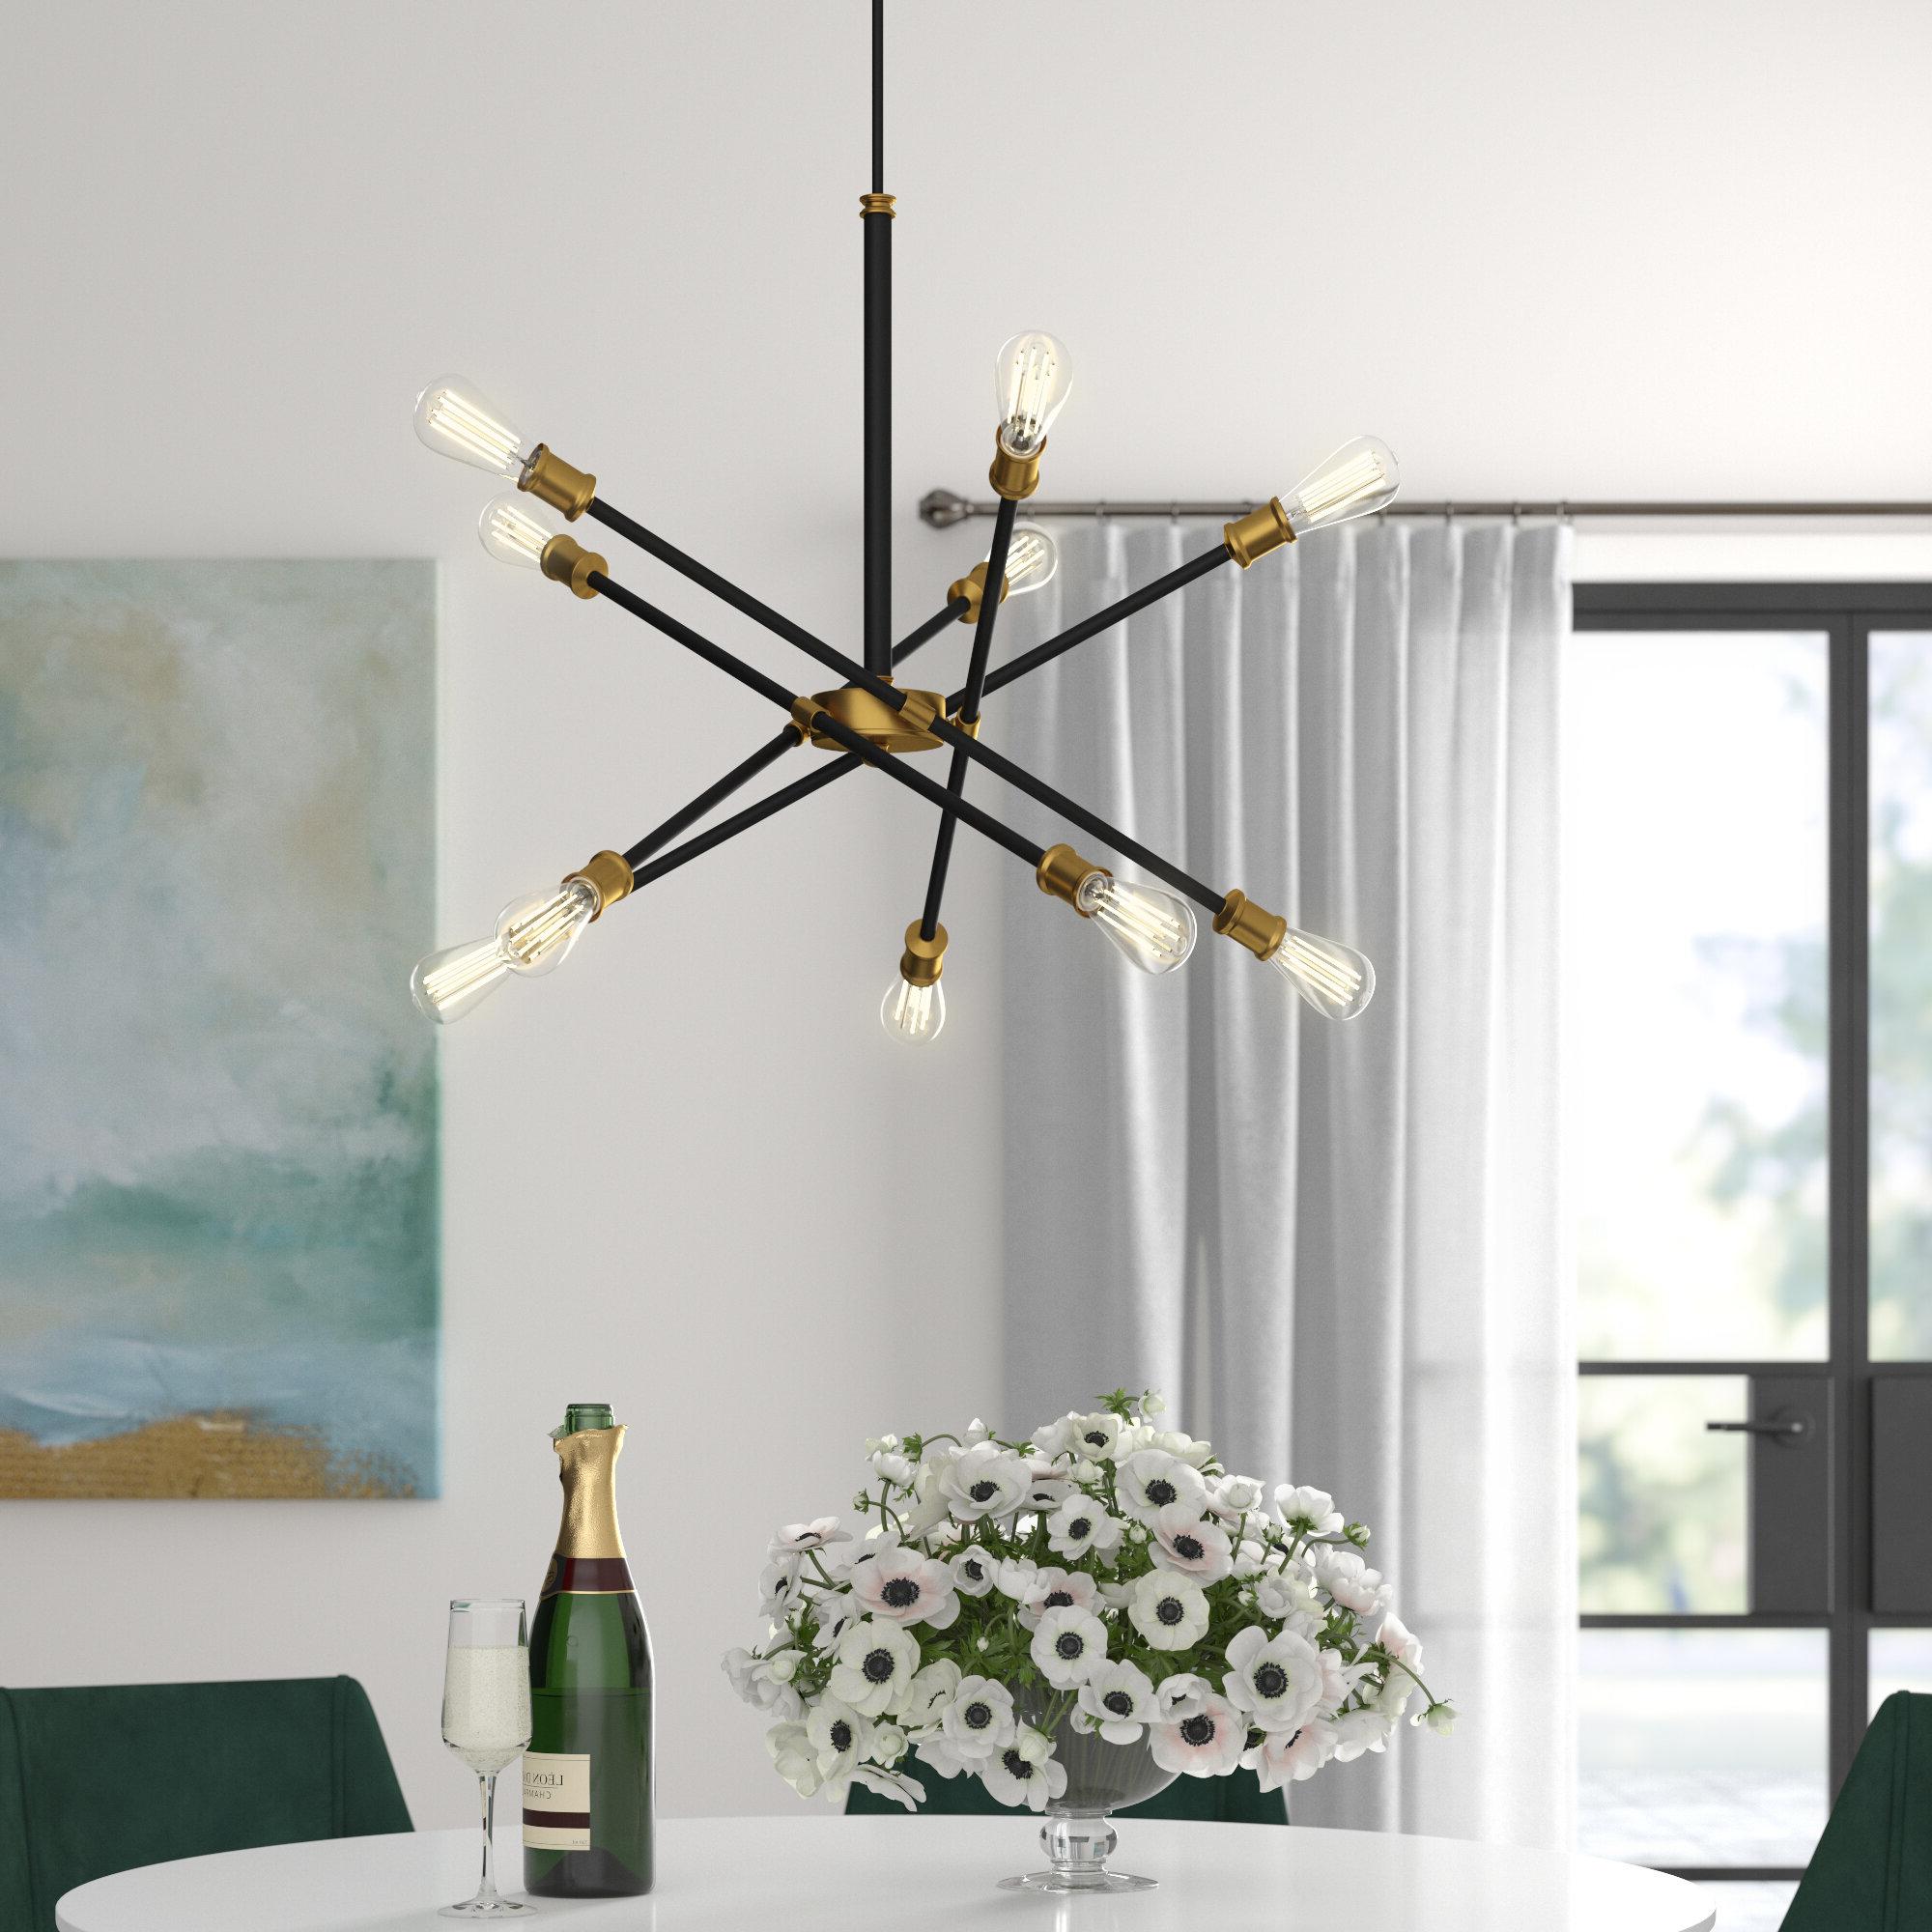 Featured Photo of Everett 10 Light Sputnik Chandeliers